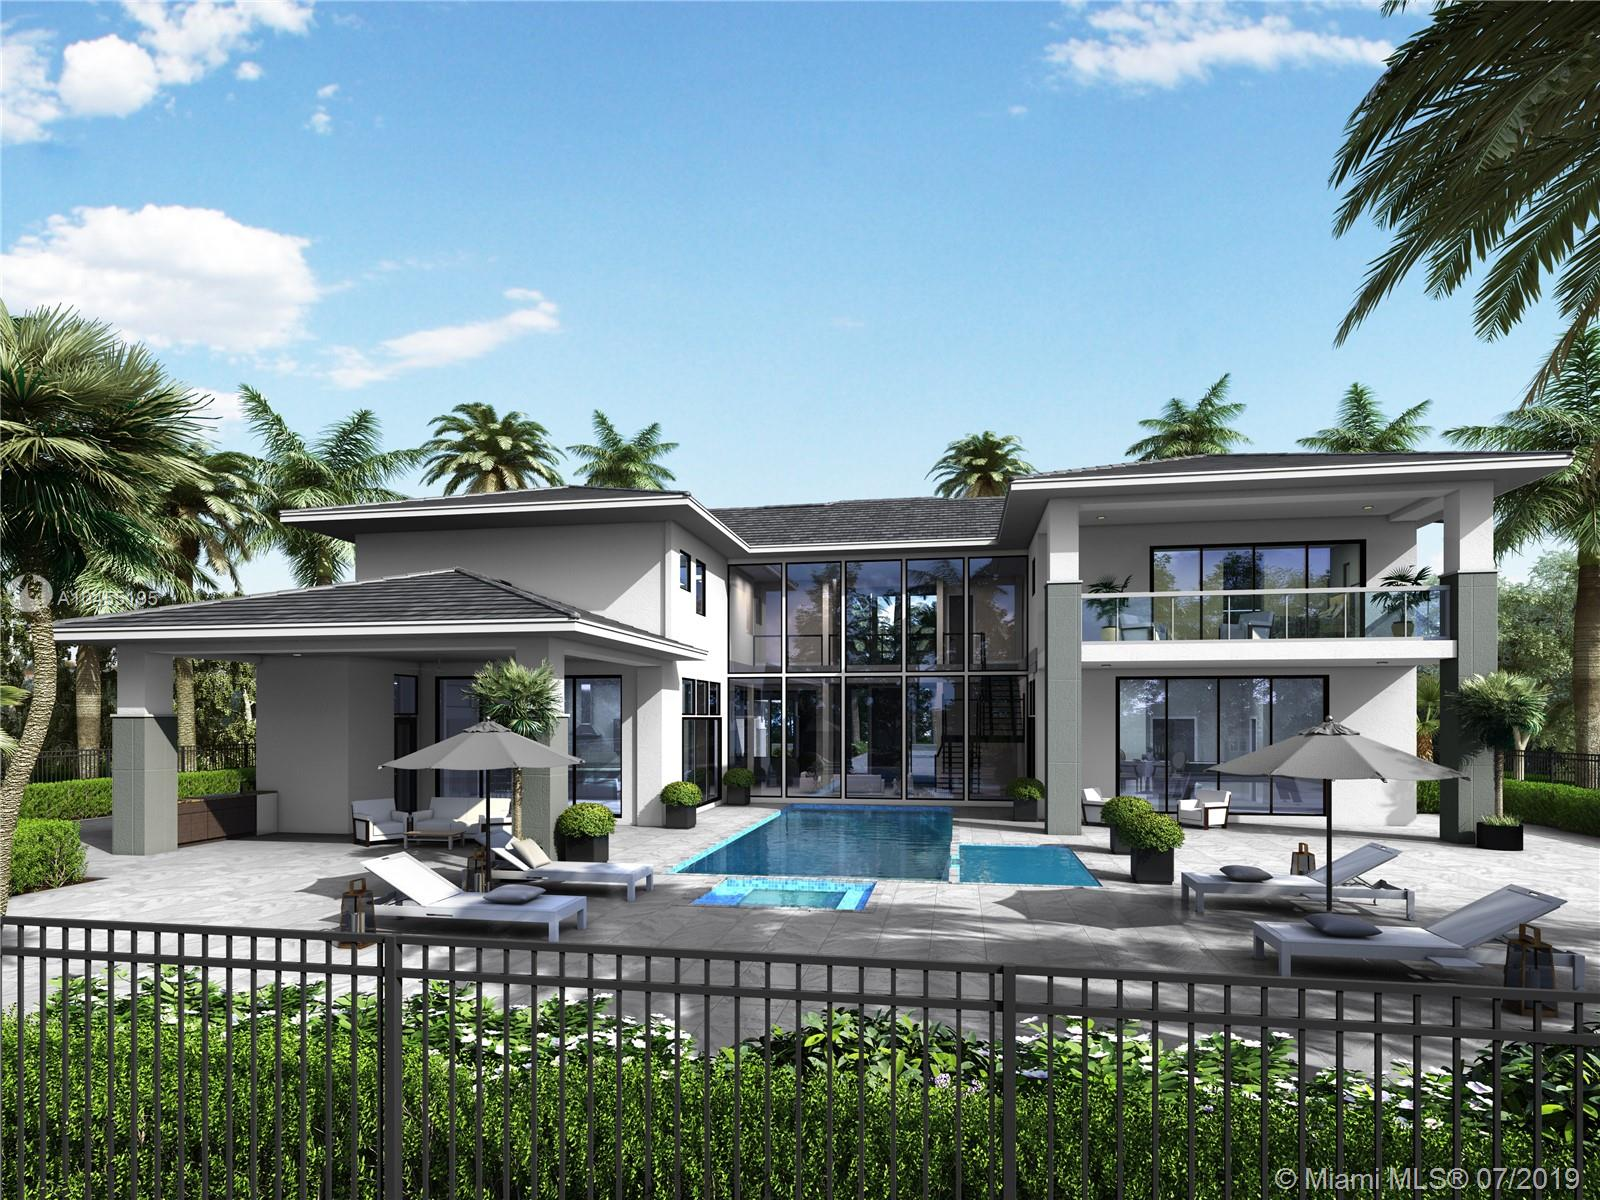 Homes for Sale in Zip Code 33332